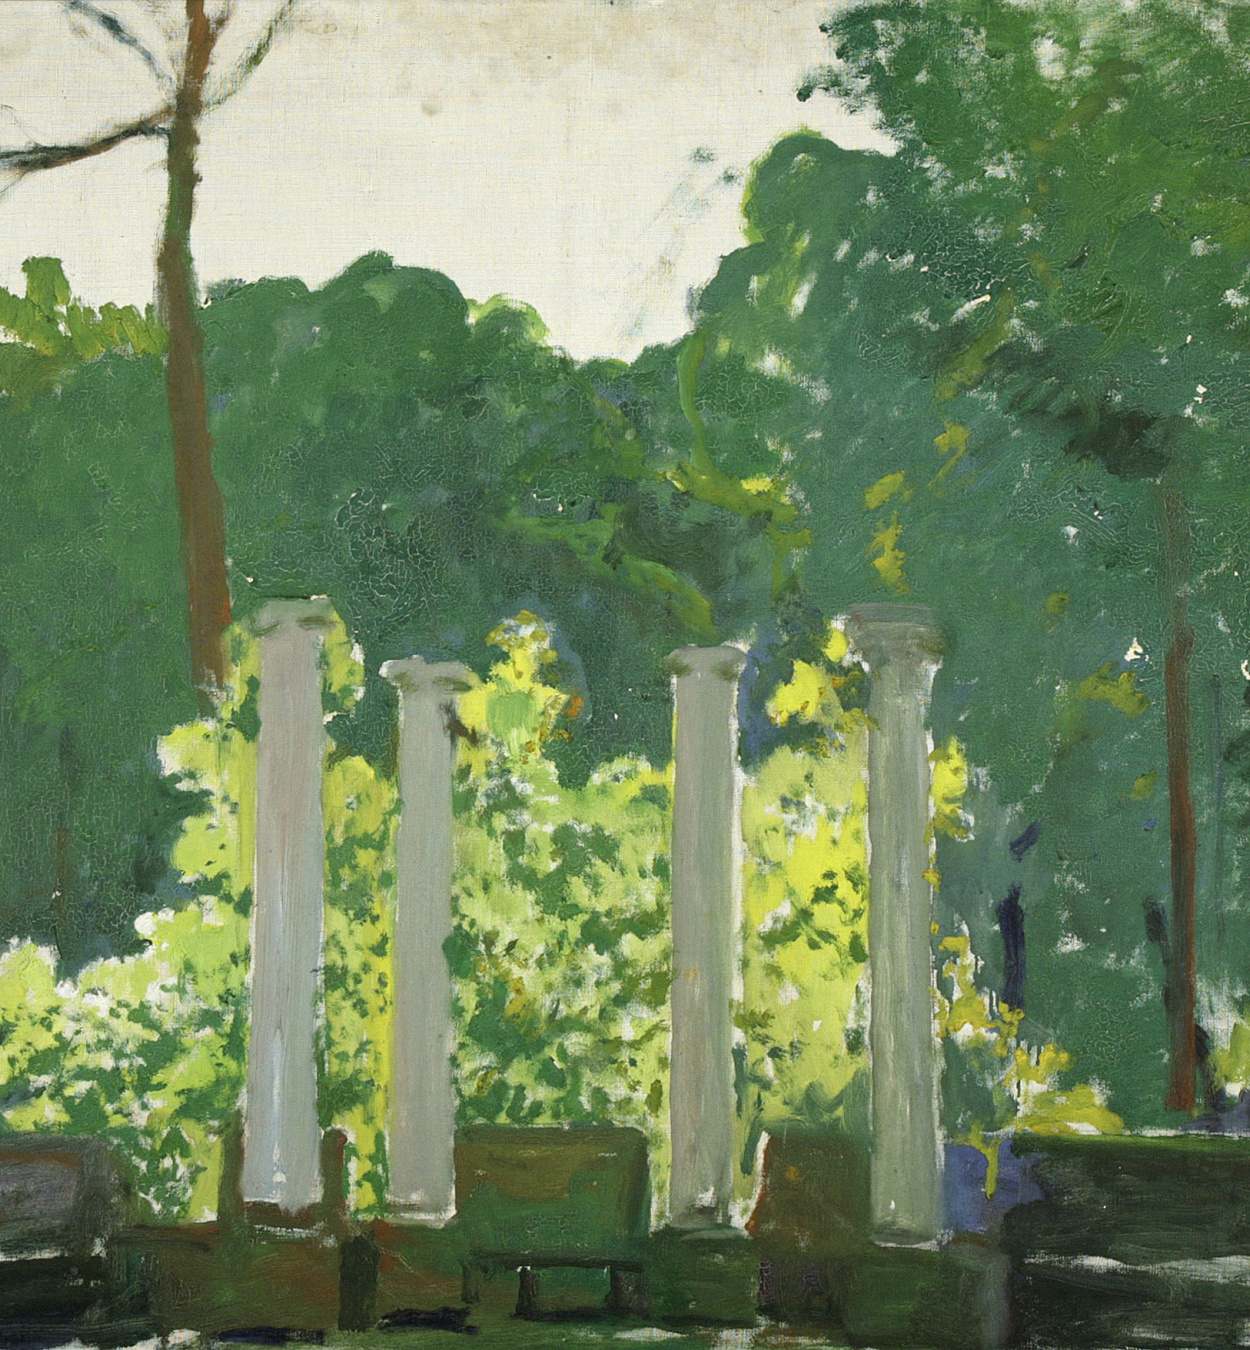 Santiago Rusiñol - Landscape. Aranjuez (unfinished work) - 1931